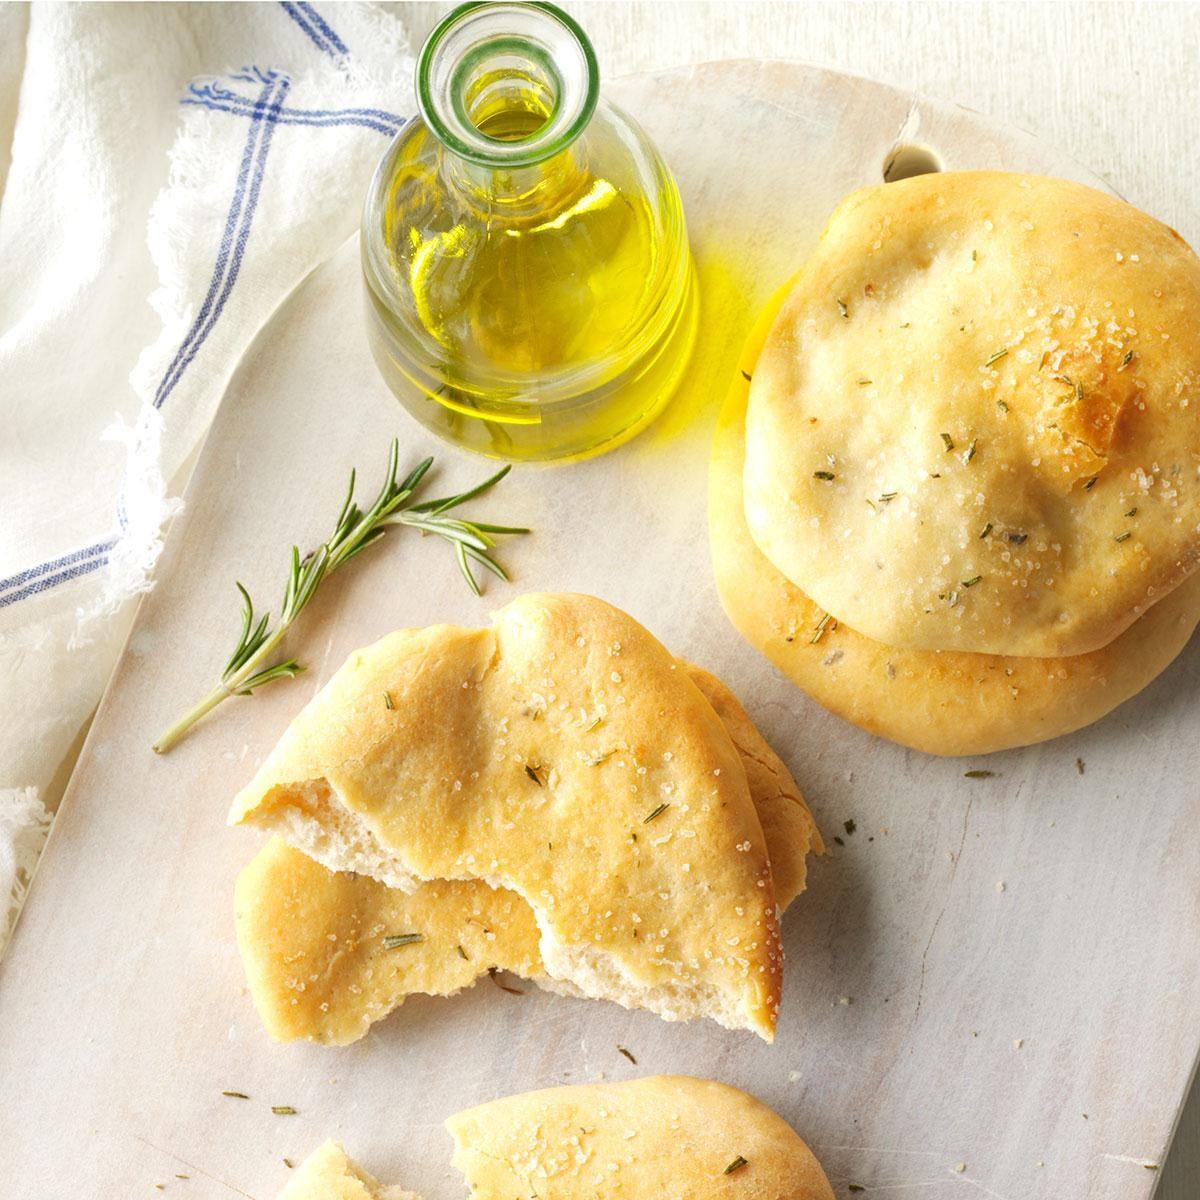 Rosemary flatbread